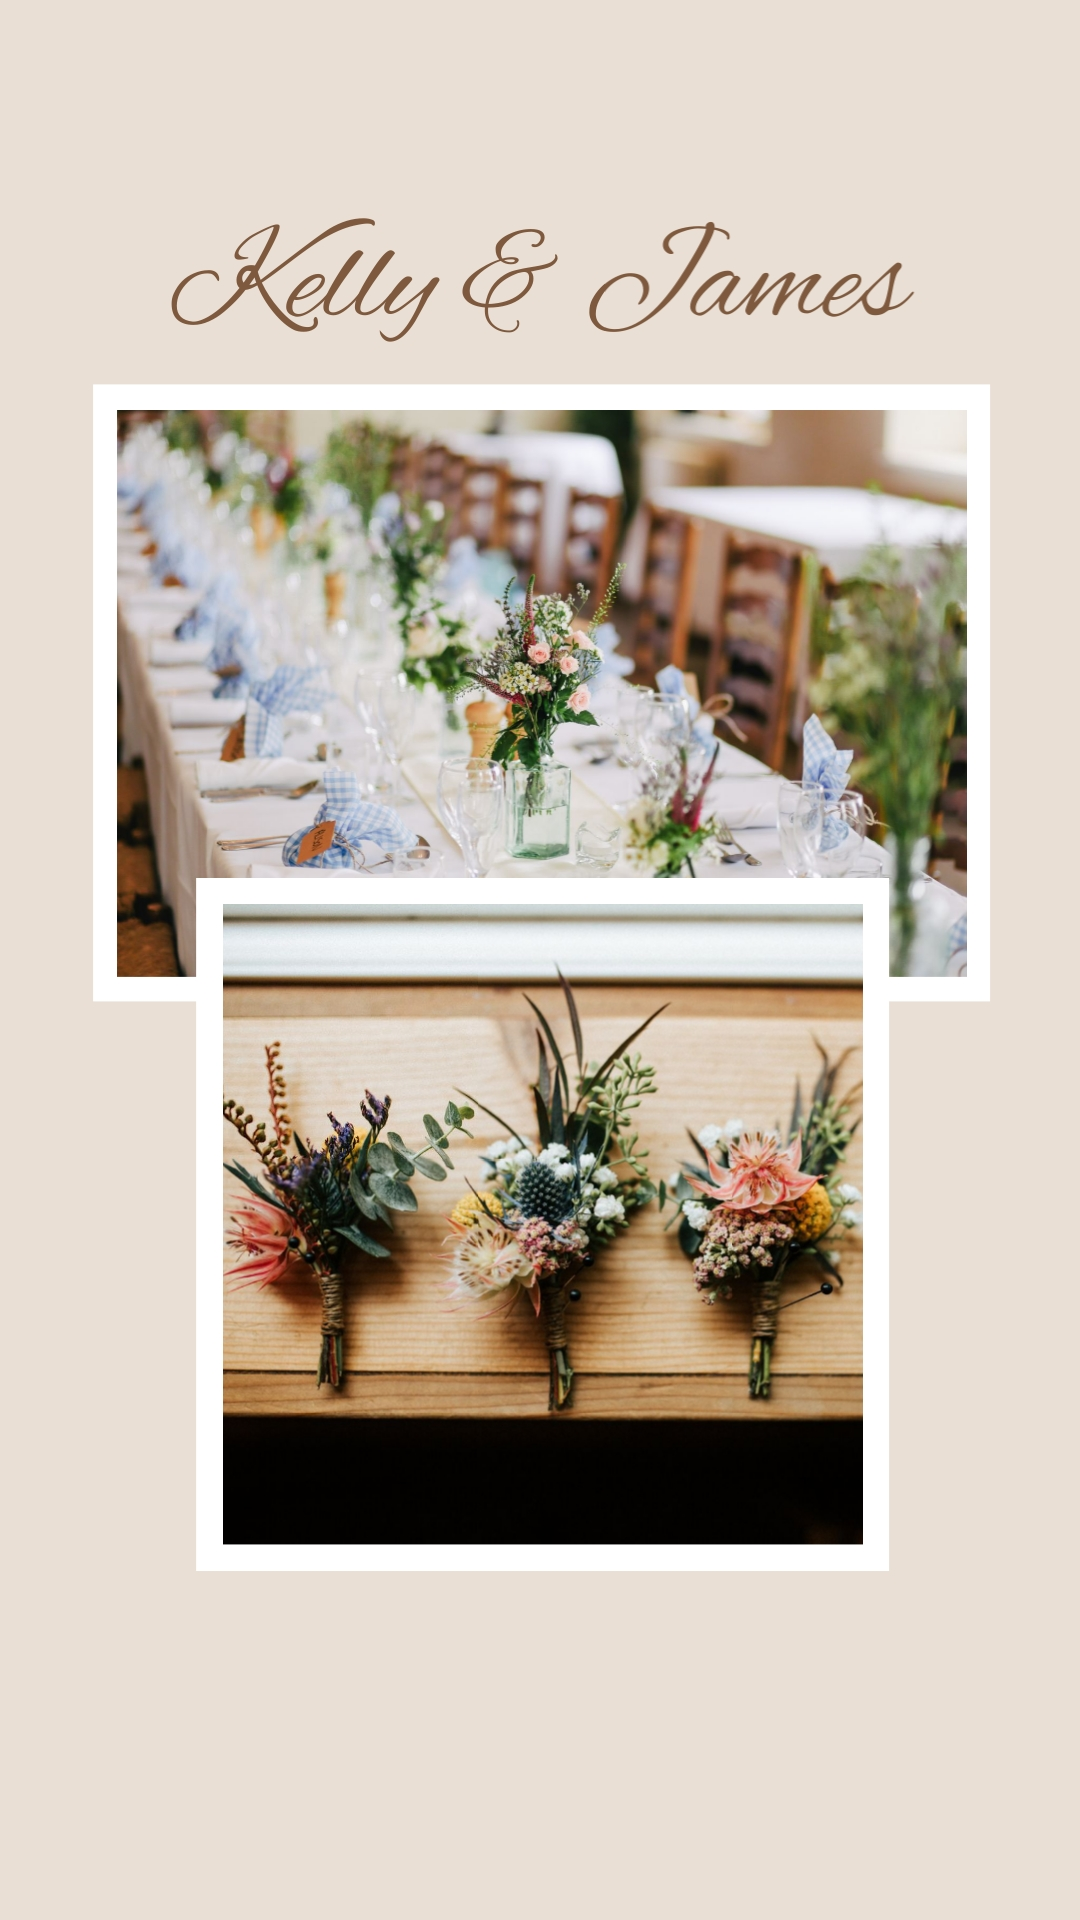 Wedding Planner Instagram Stories Template